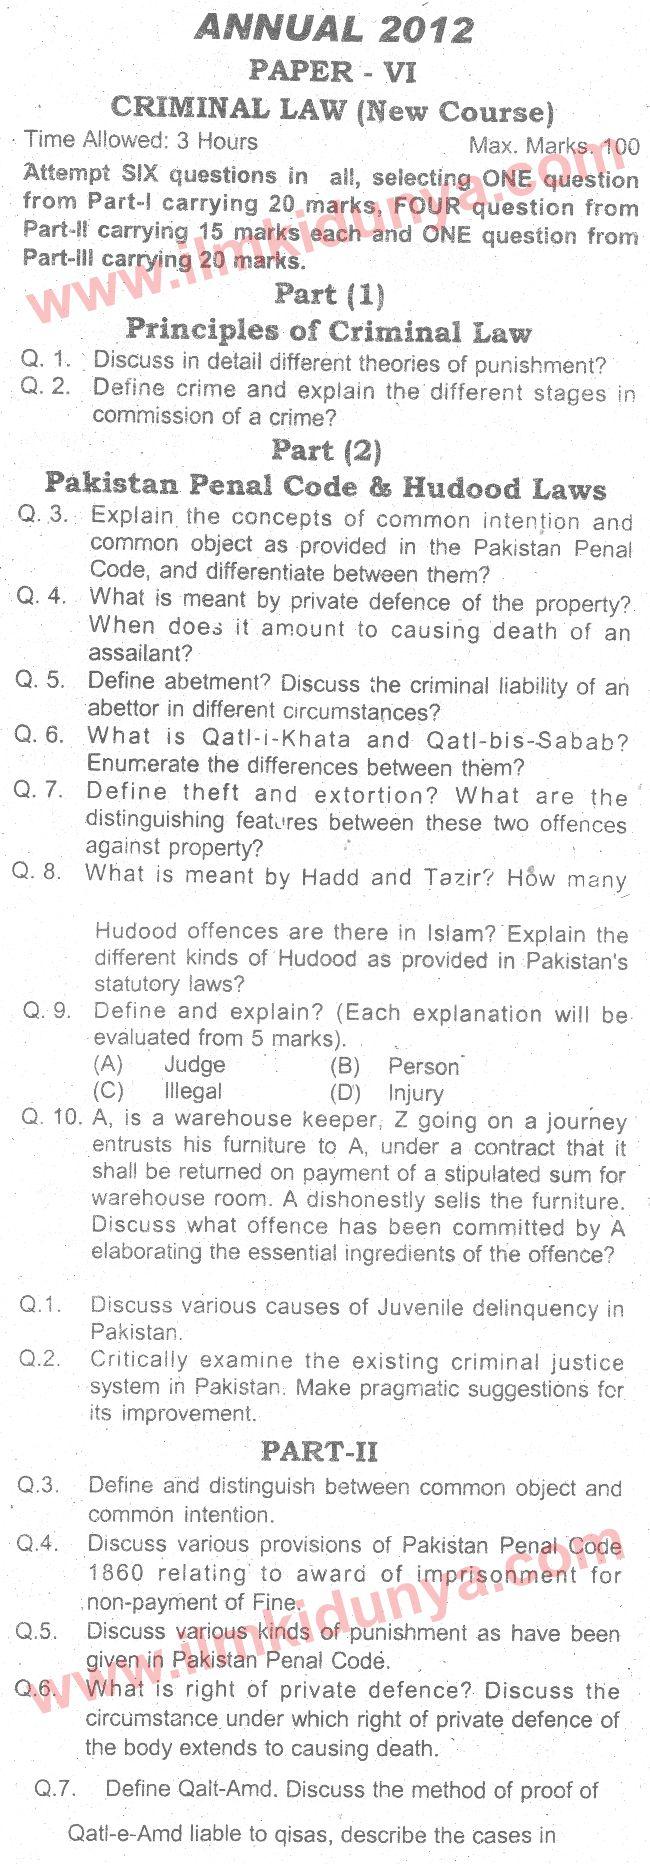 Past Papers 2012 LLB Part 1 Criminal Law Paper 6